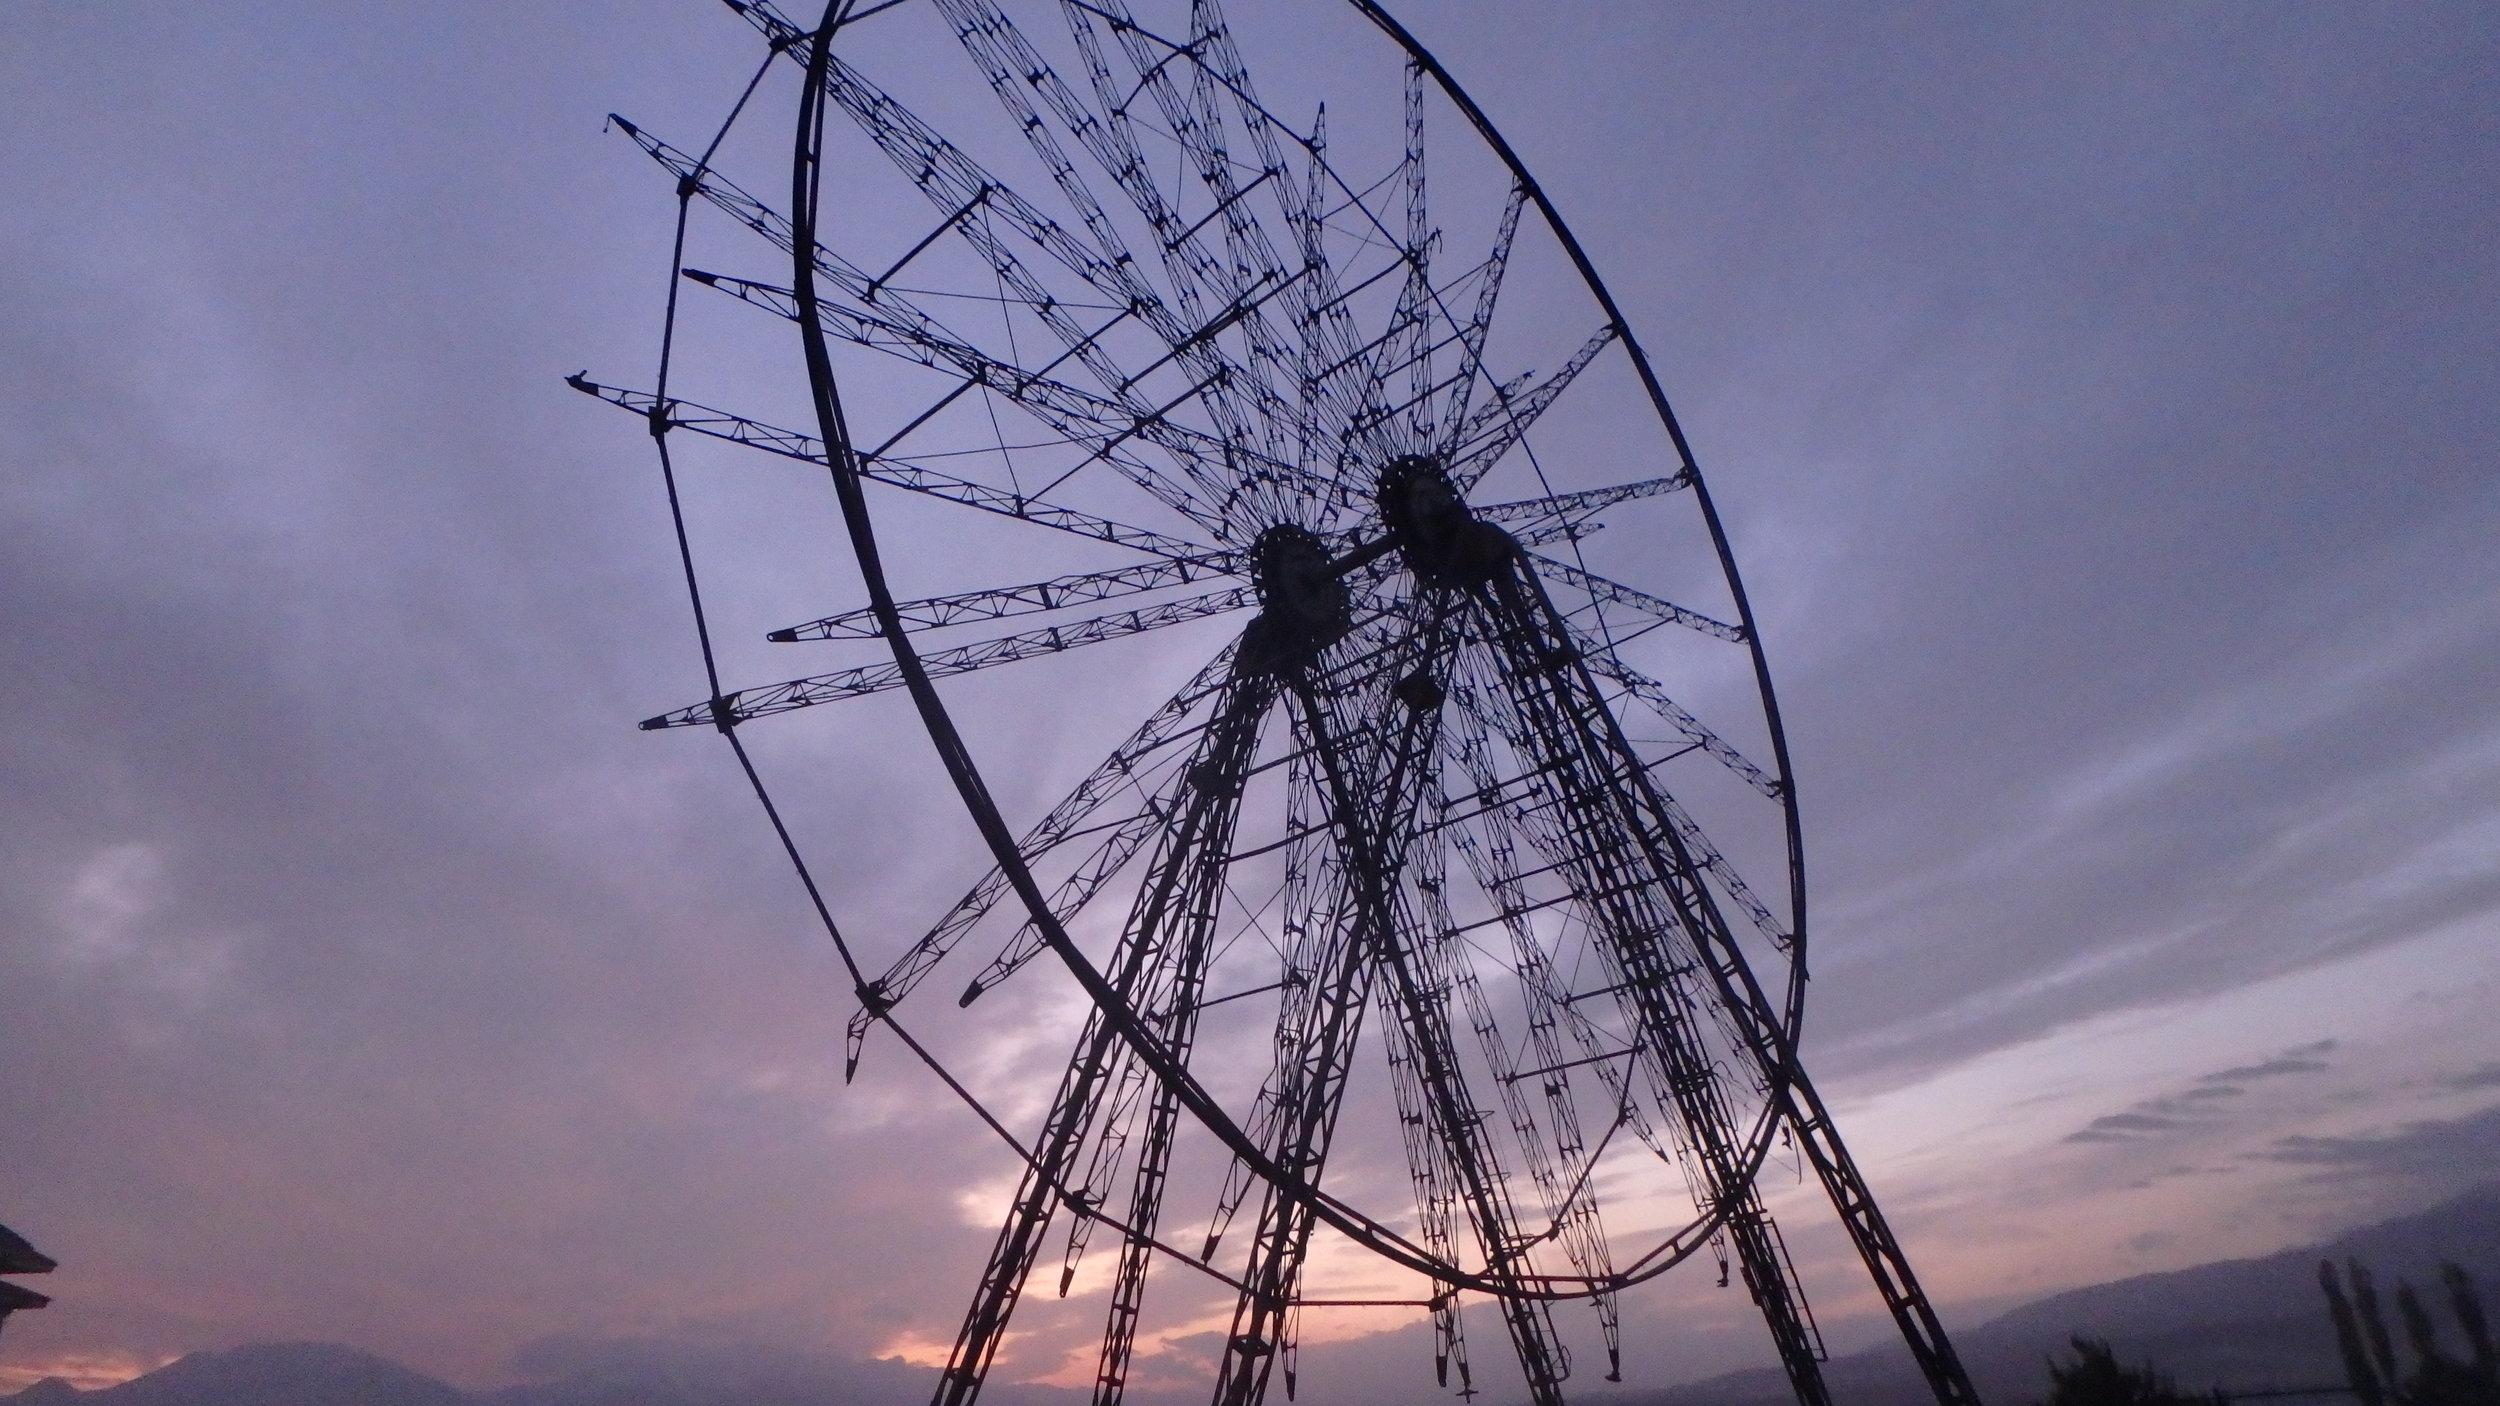 Sunset Rides, Toktugul.